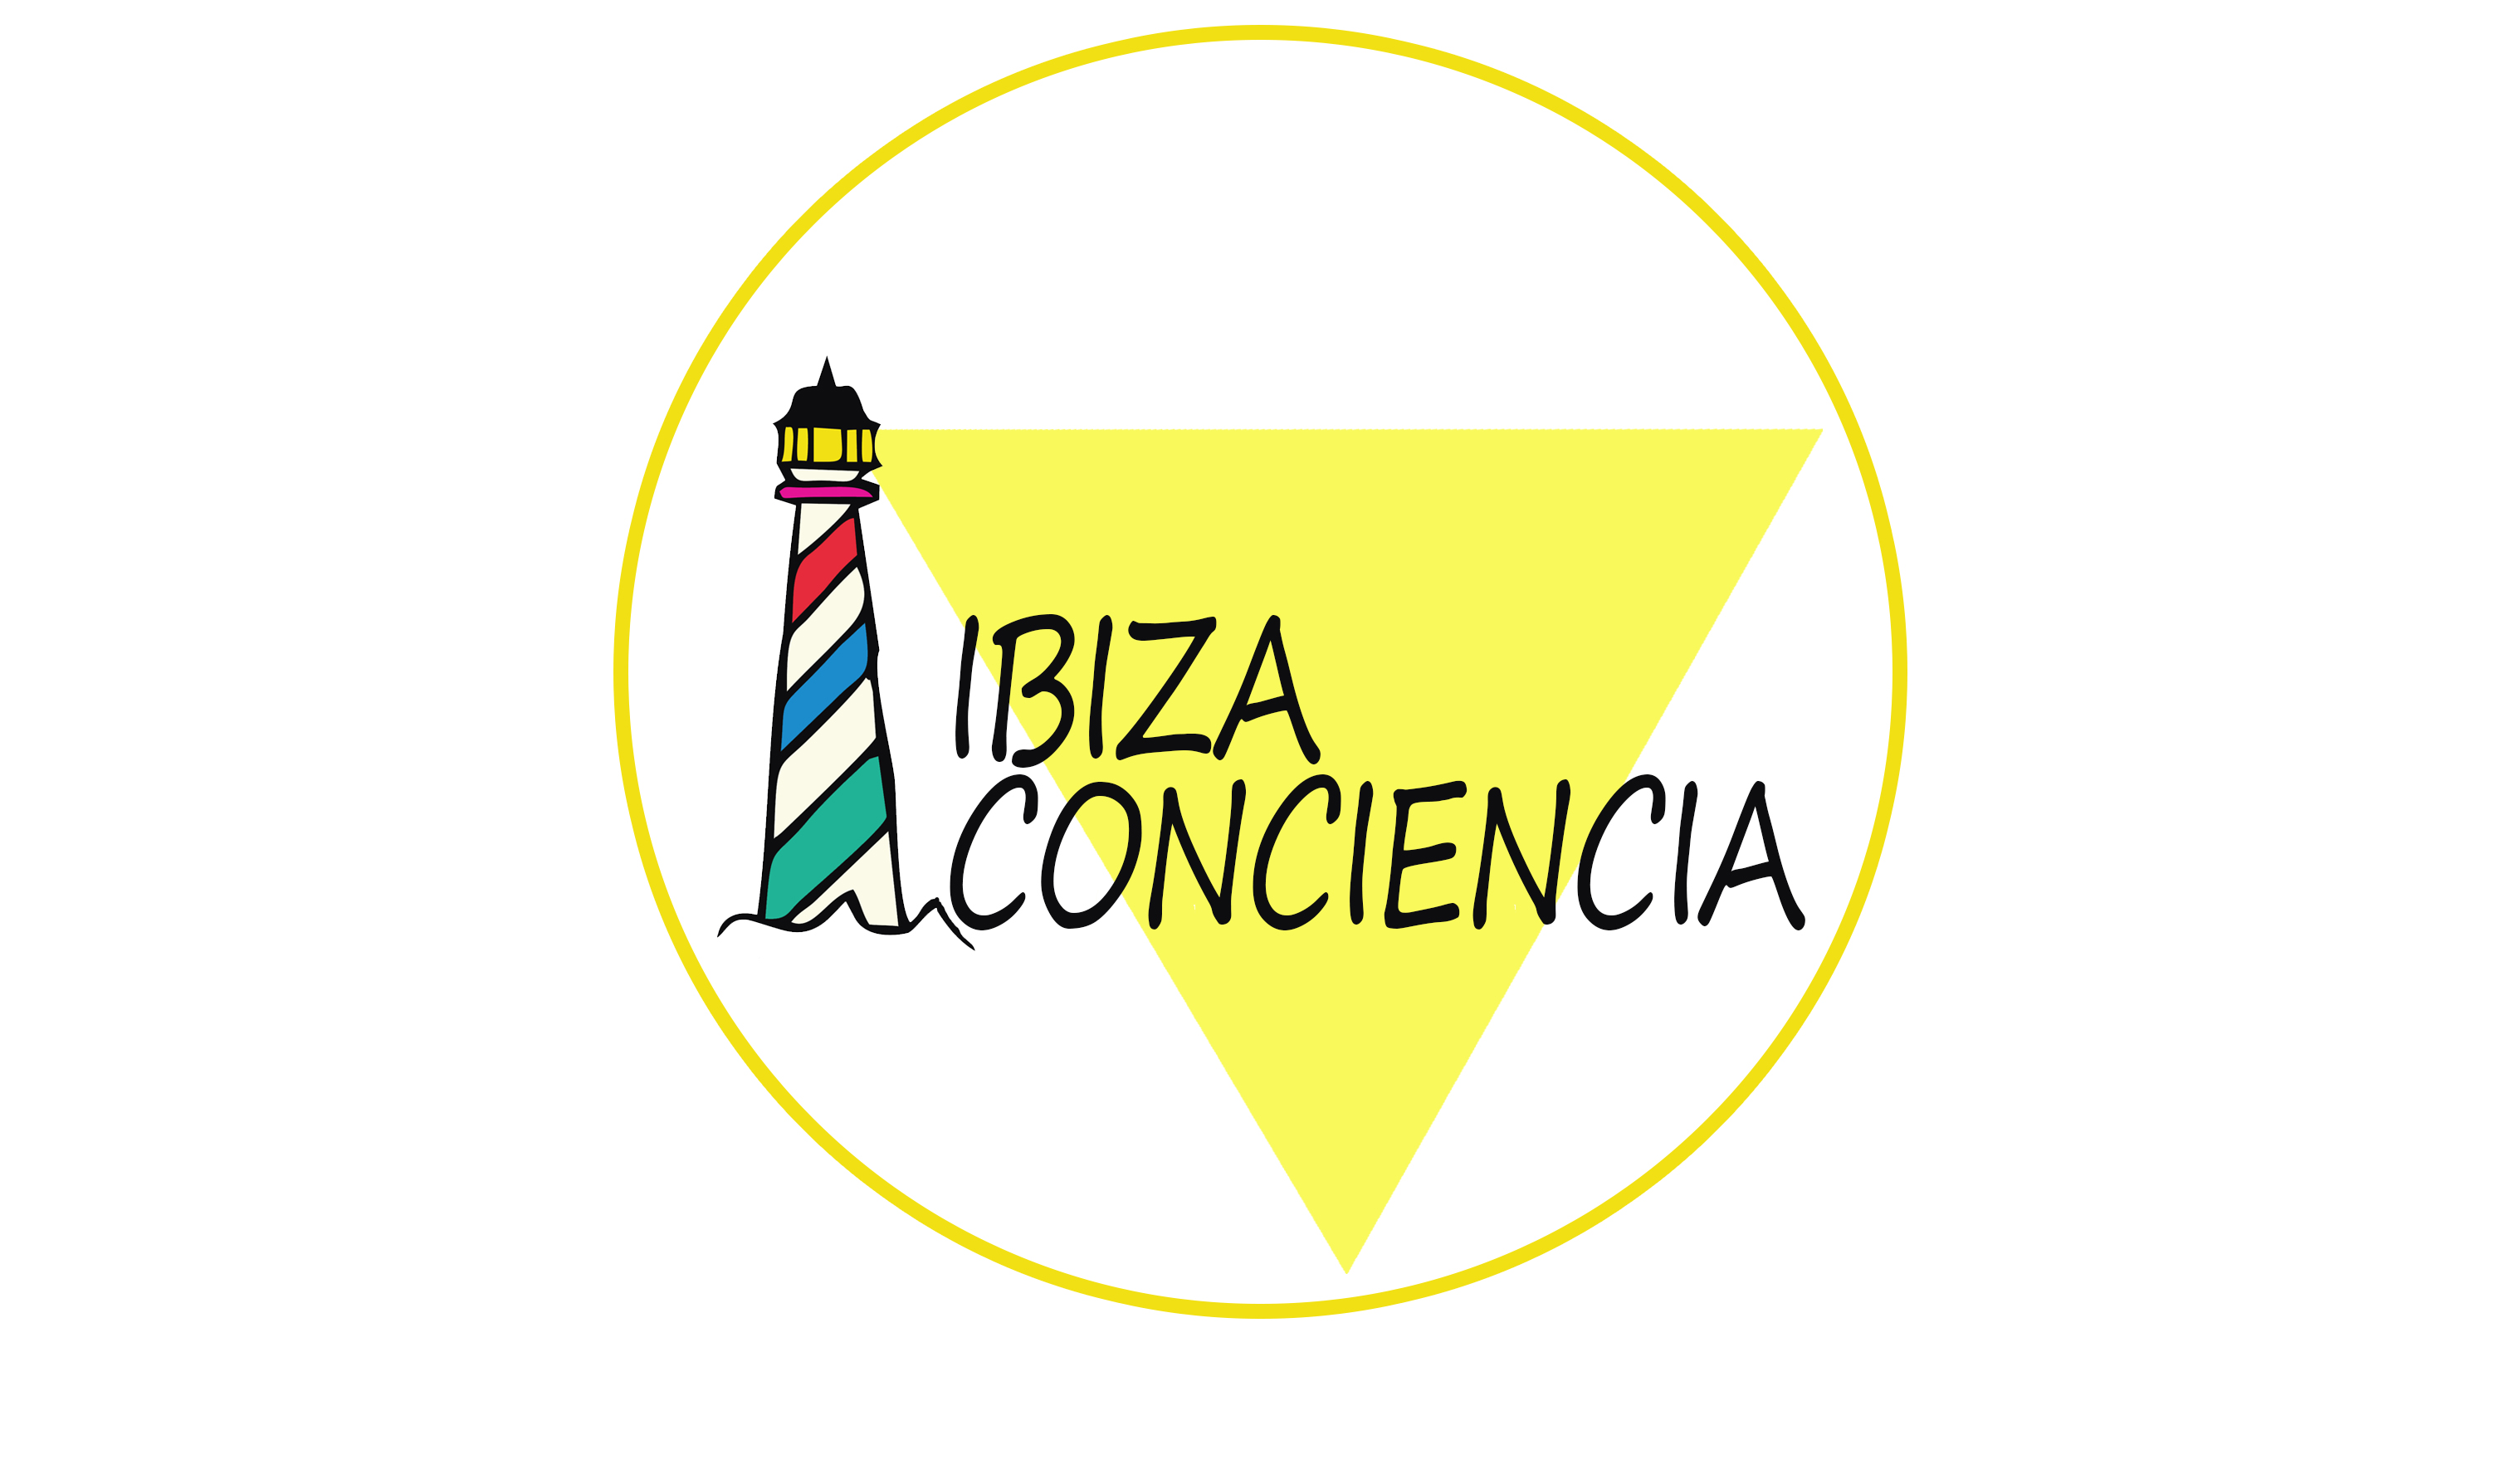 IbizaConciencia.org